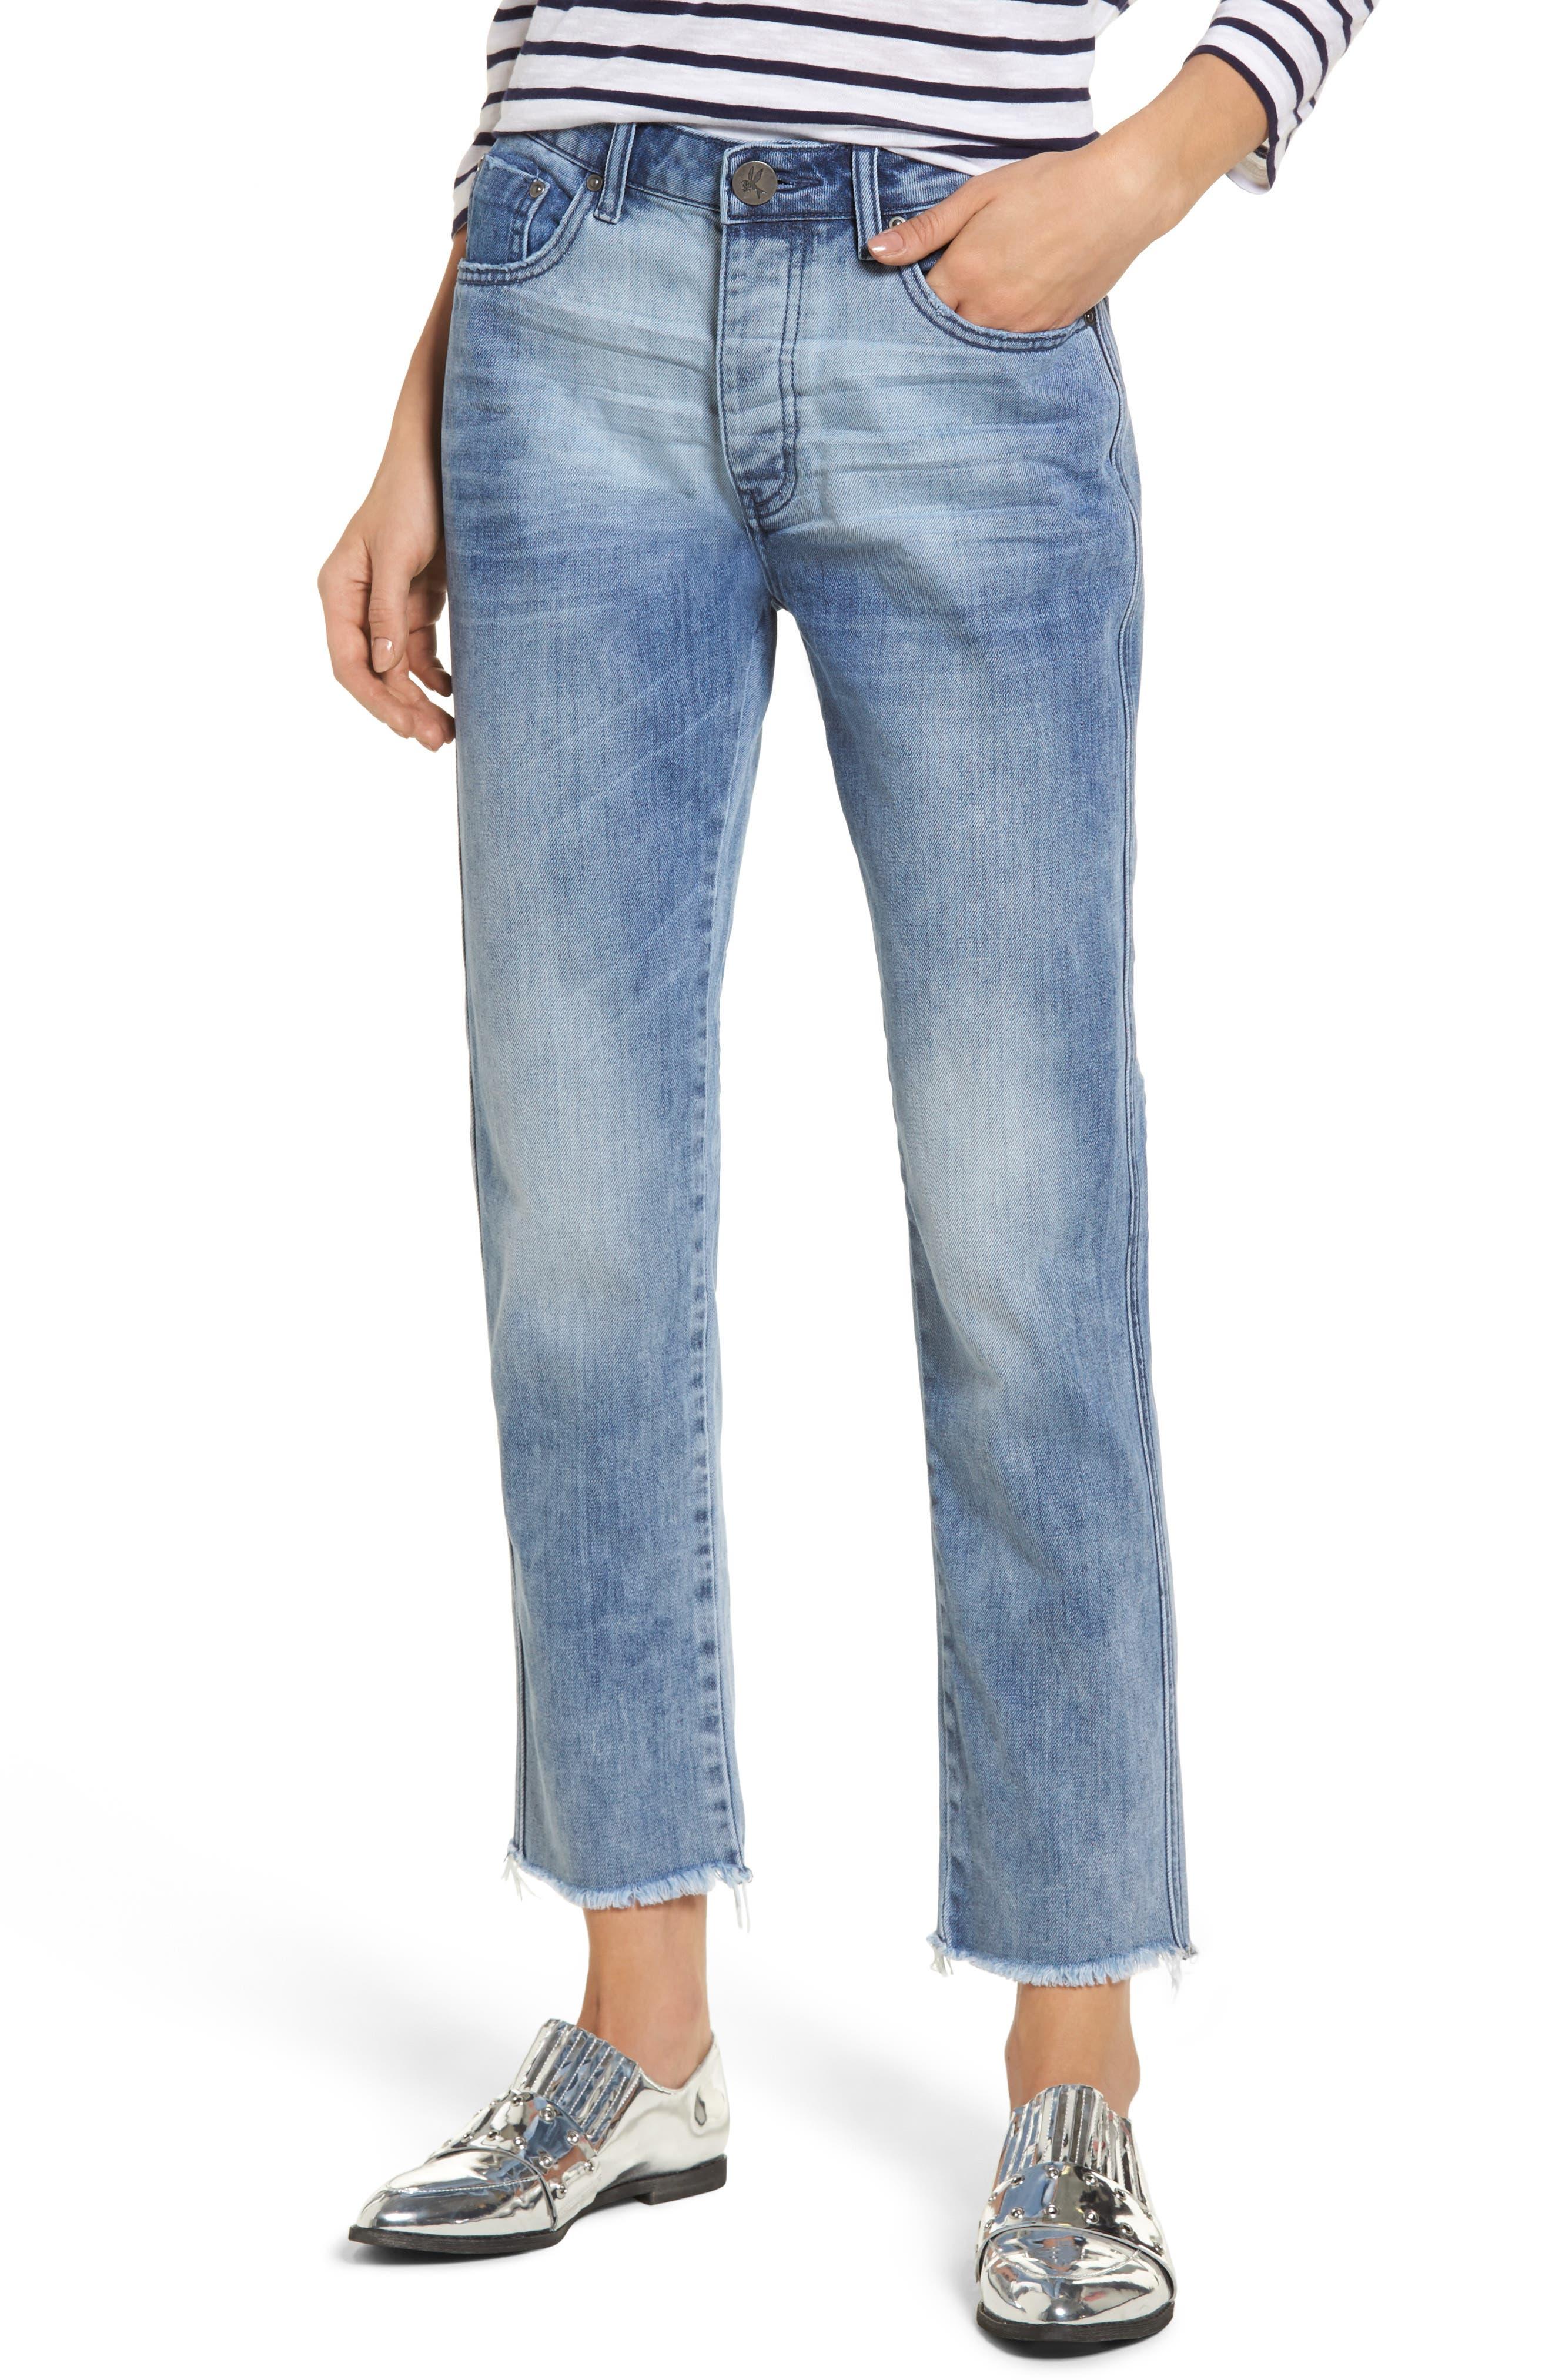 Tuckers High Waist Straight Leg Jeans,                         Main,                         color, Blue